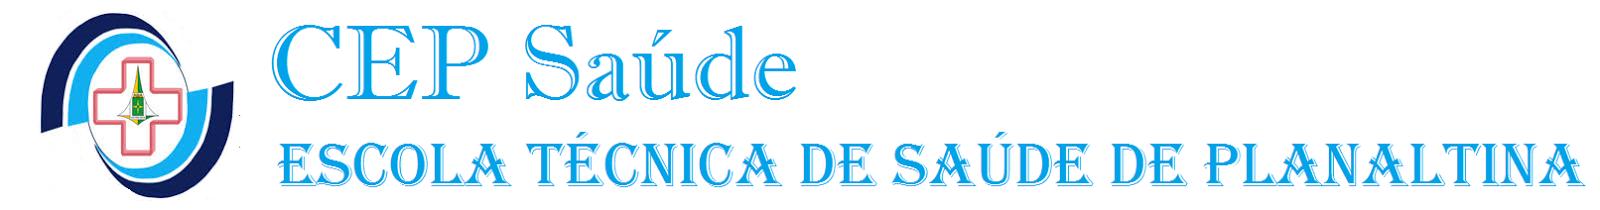 CEP - Escola Técnica de Saúde de Planaltina